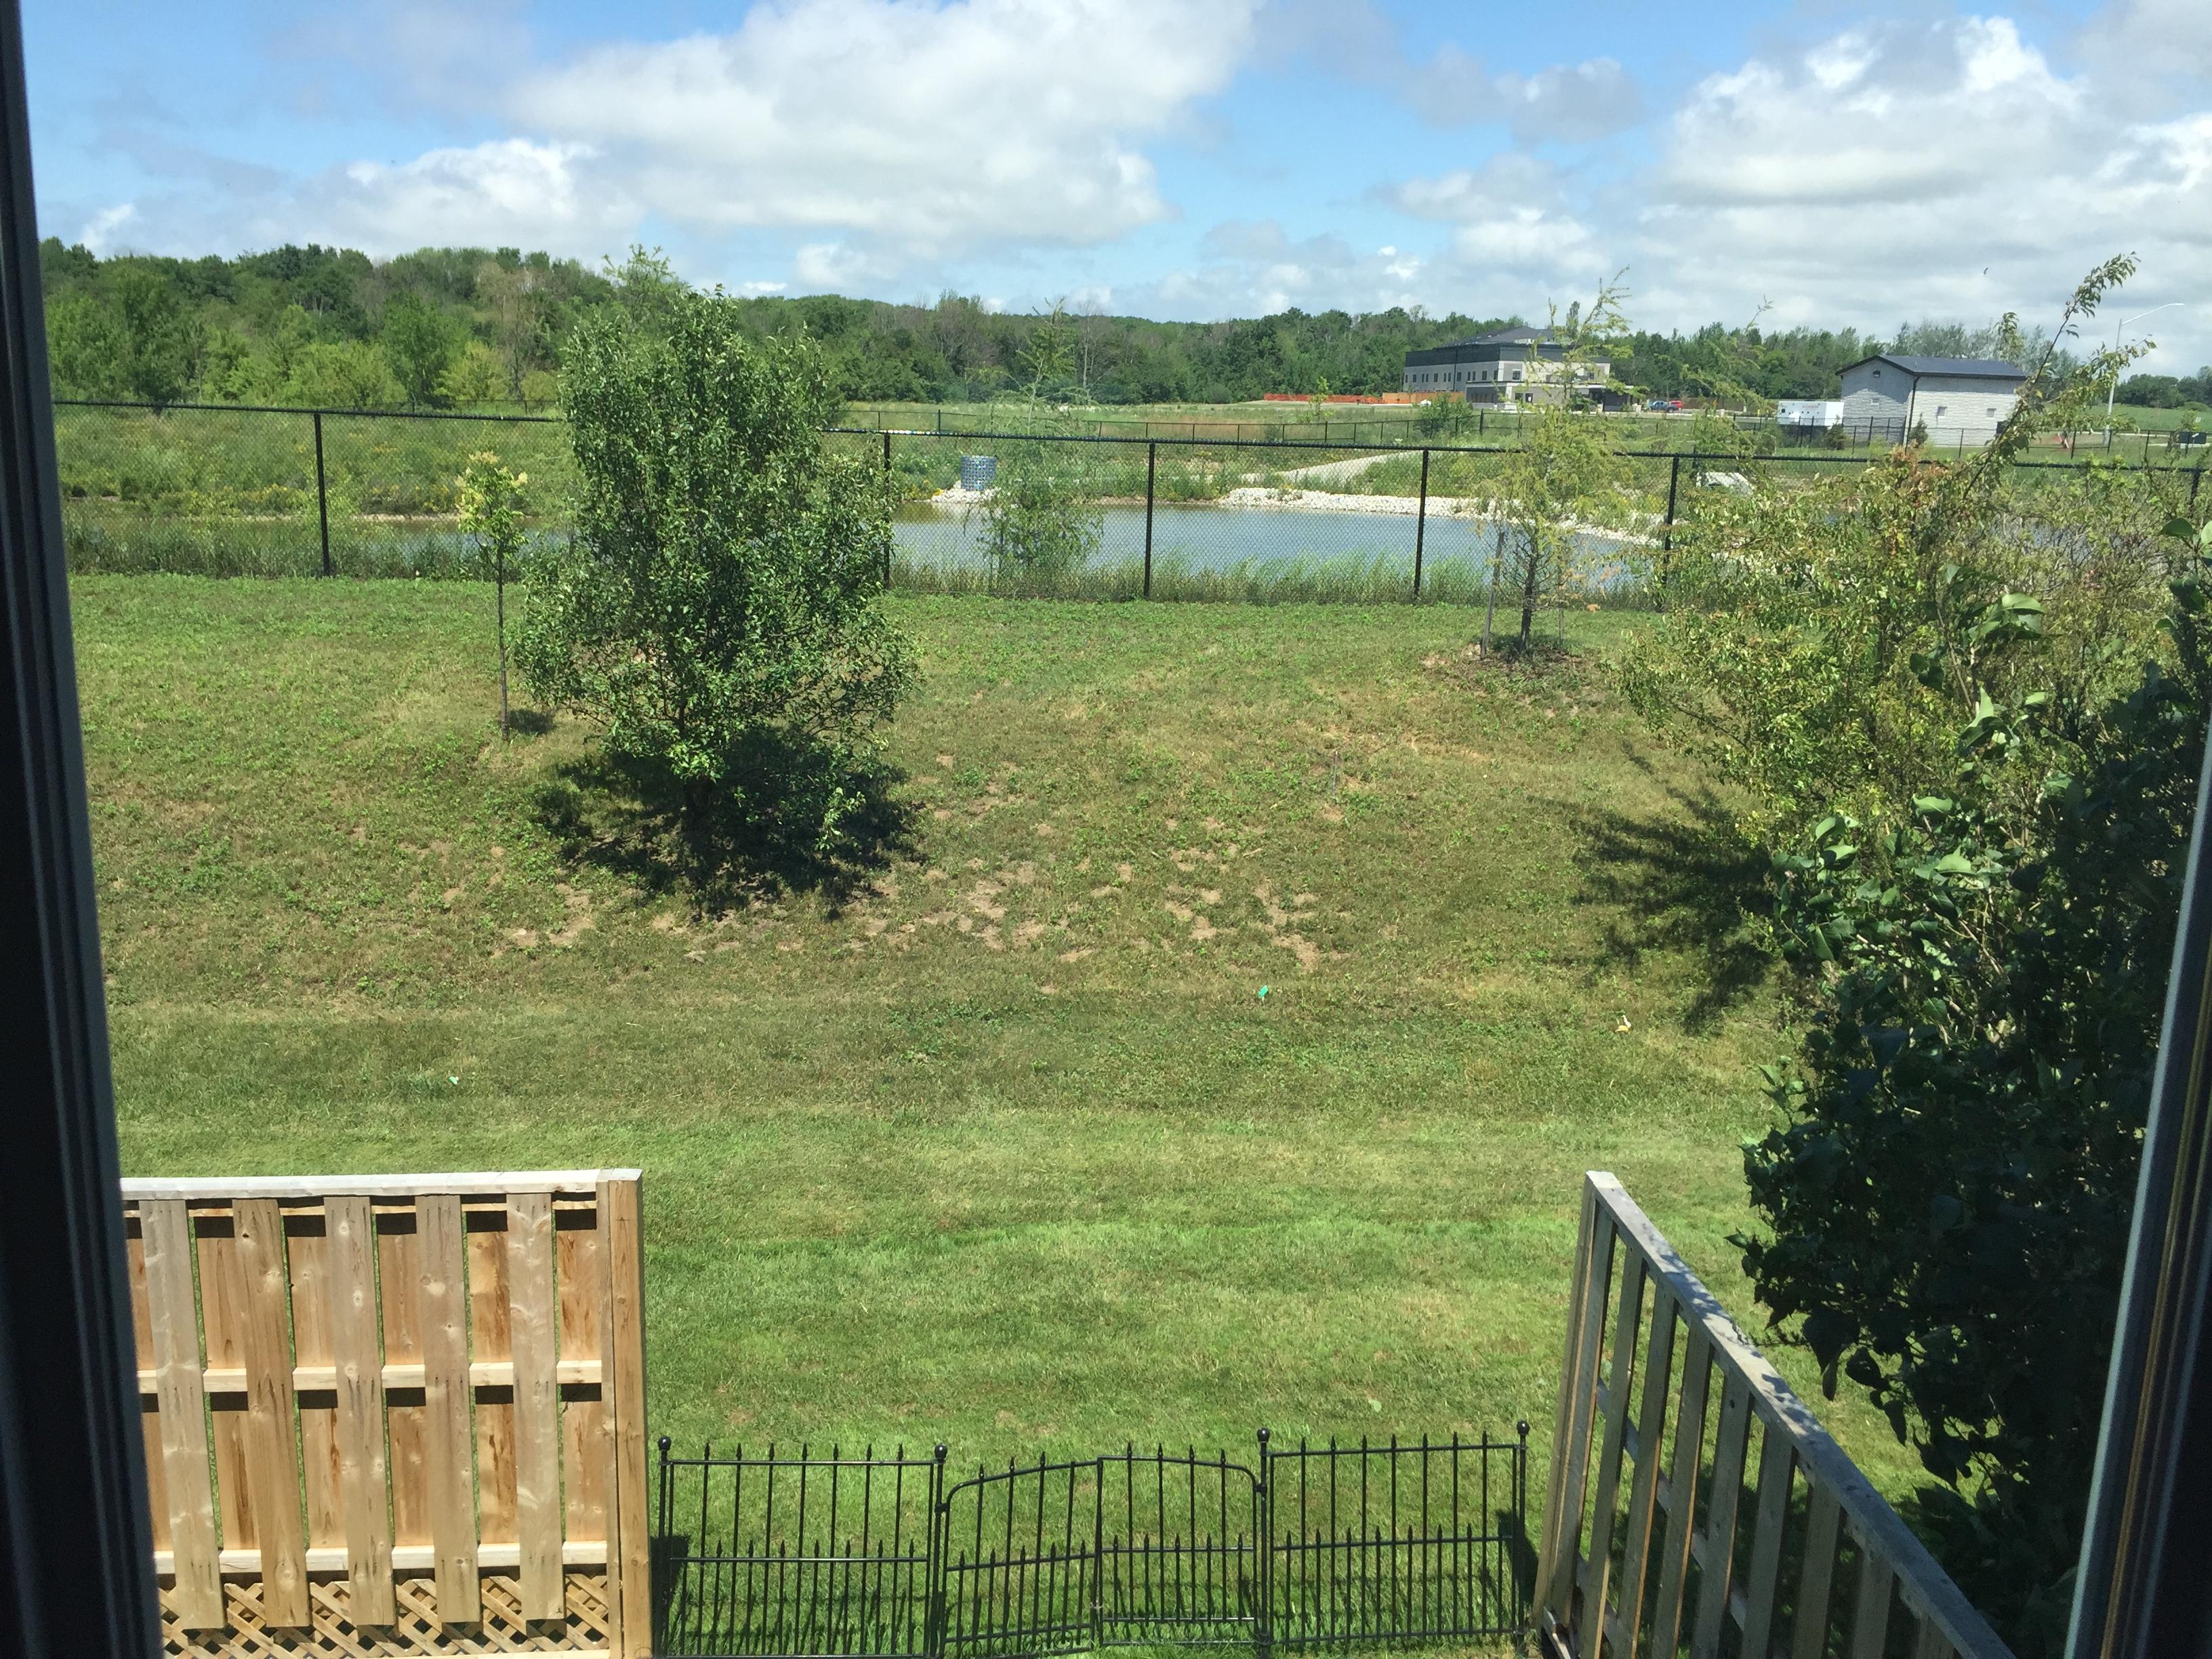 24 Philip Place, Kincardine, Ontario  N2Z 2E5 - Photo 3 - RP4295722363